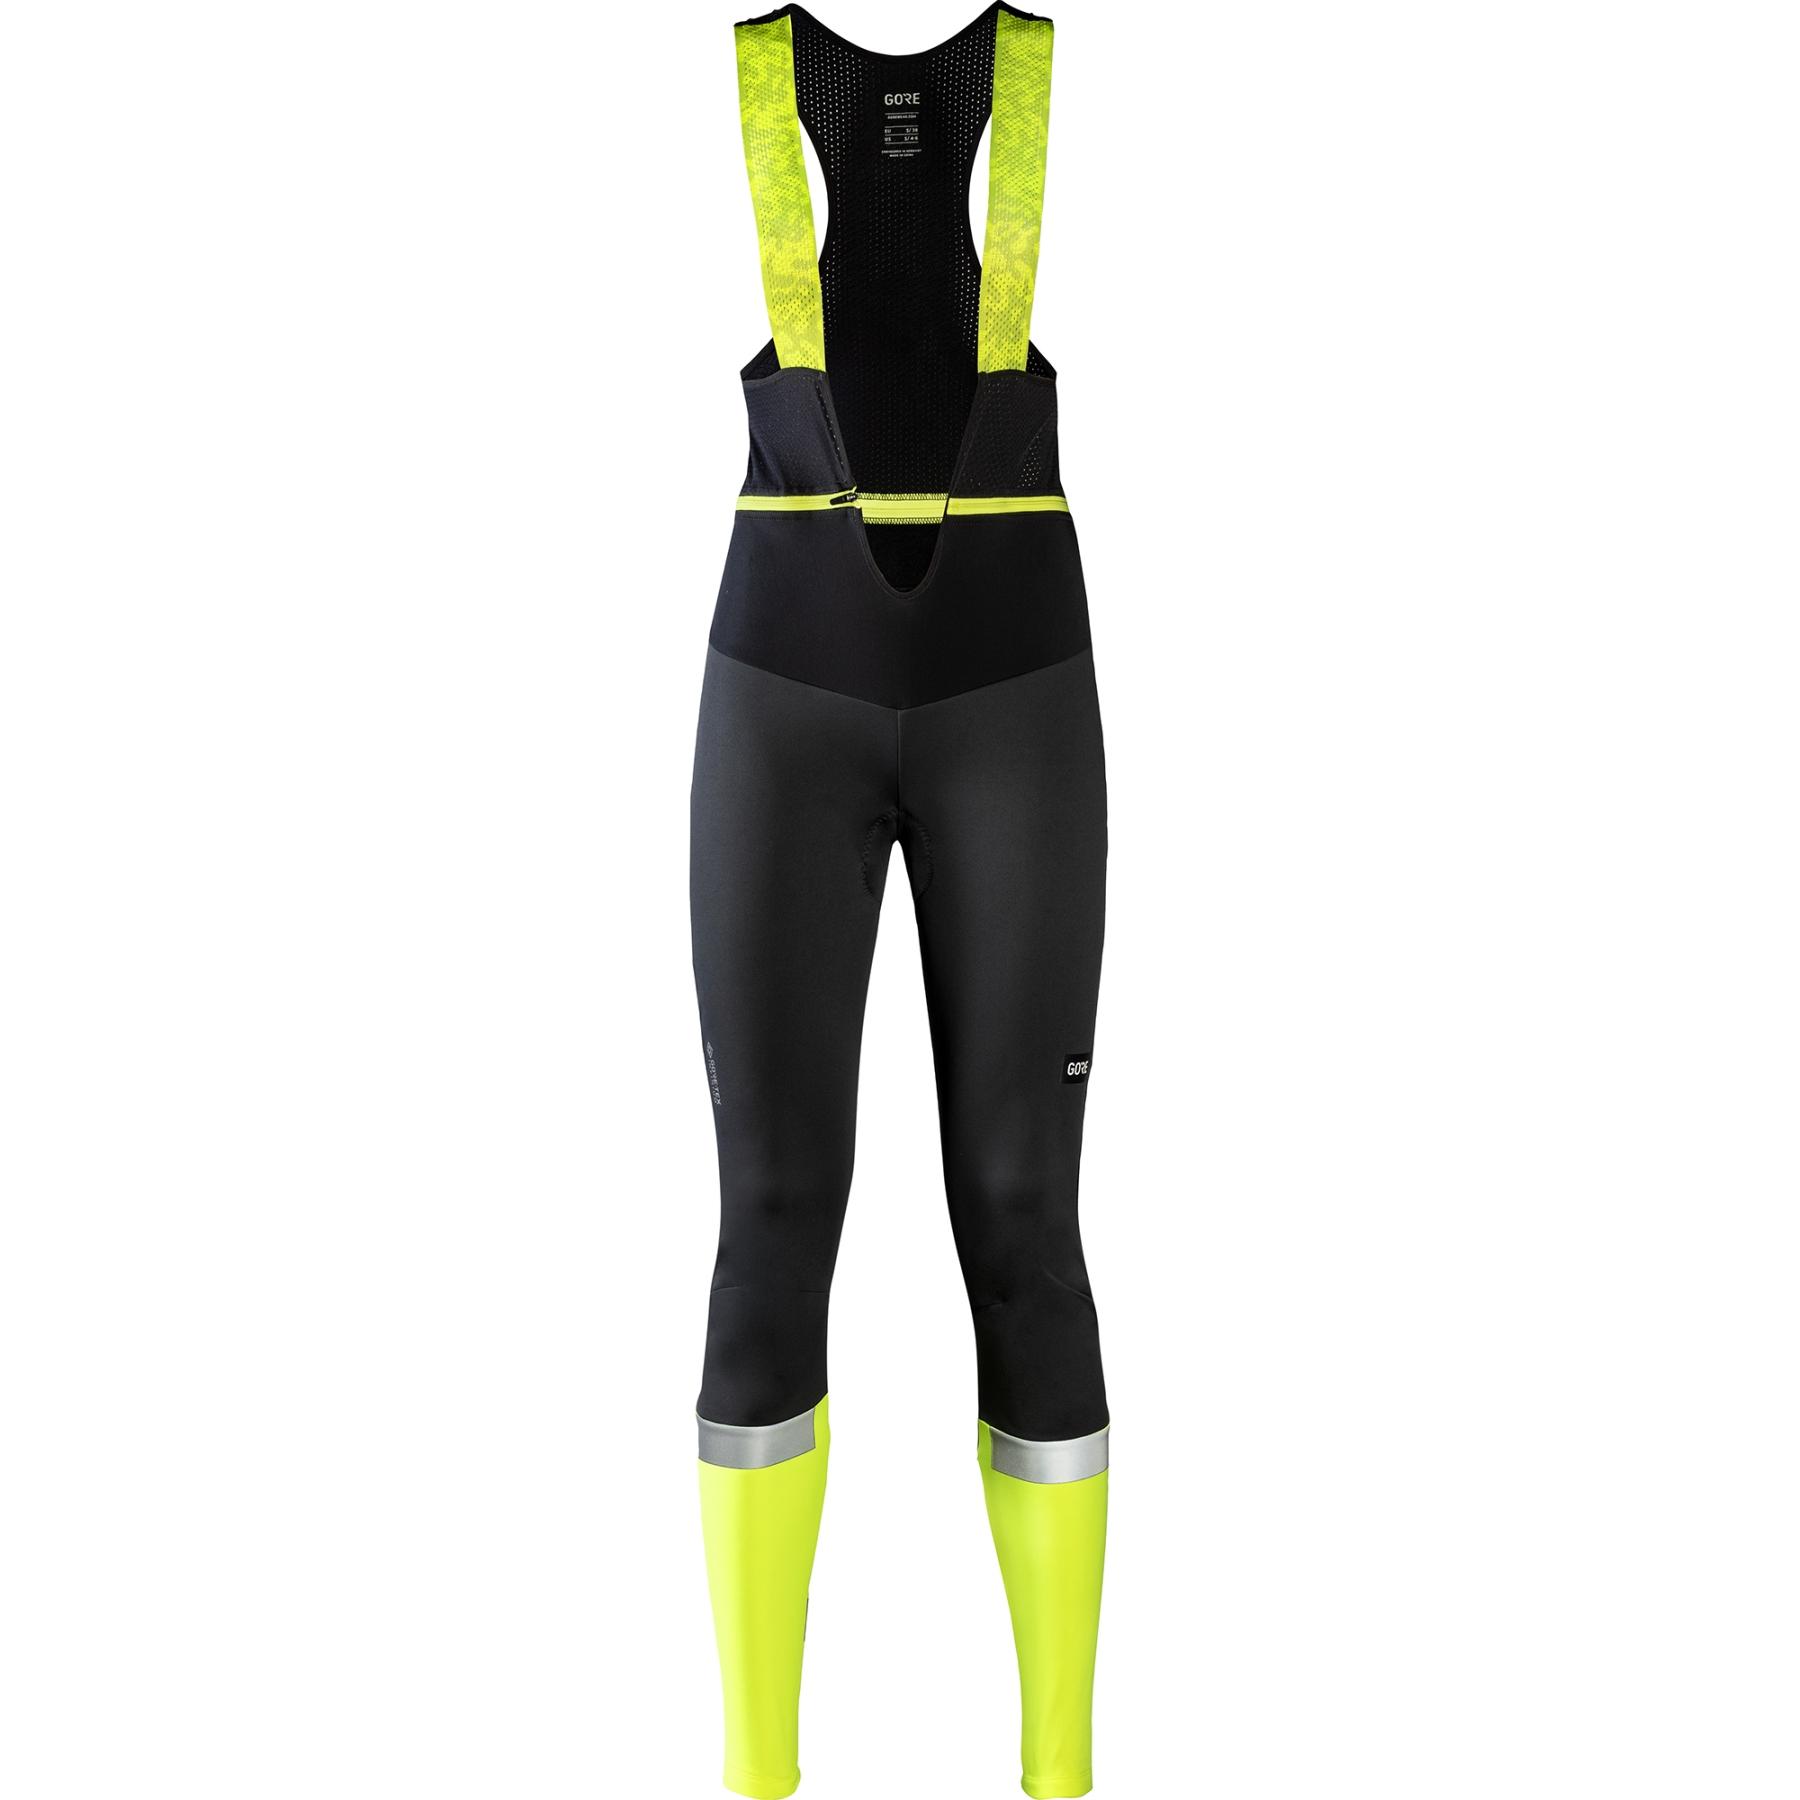 GORE Wear Ability Thermo Peto y Tirantes de Pantalones para Mujer - negro/amarillo neón 9908